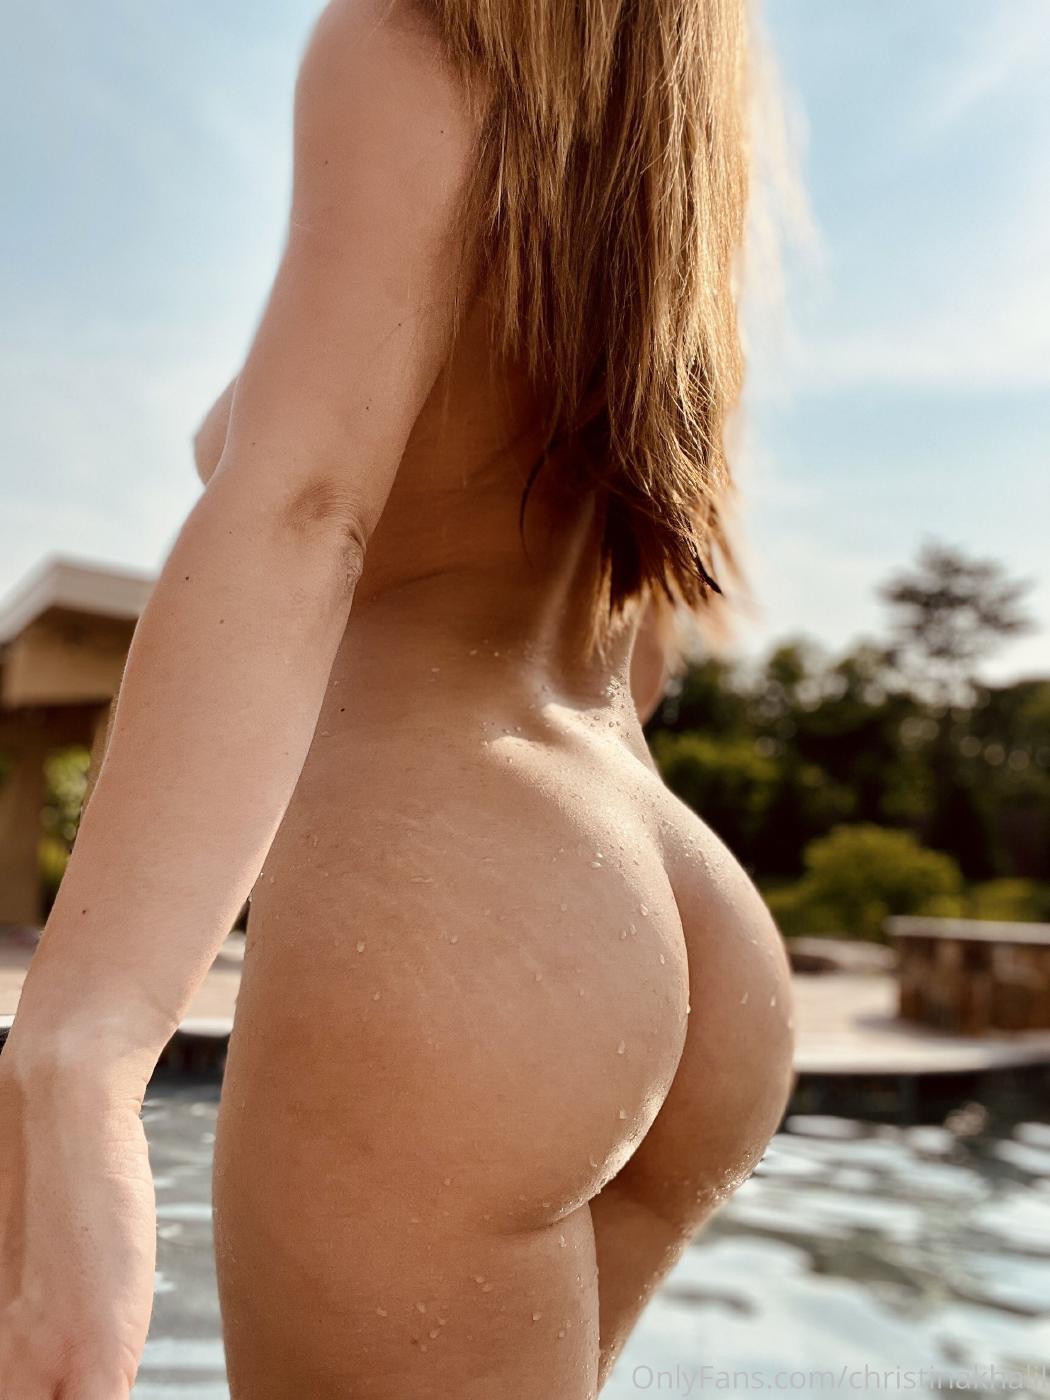 Christina Khalil Topless Pool Onlyfans Set Leaked Xdtigw